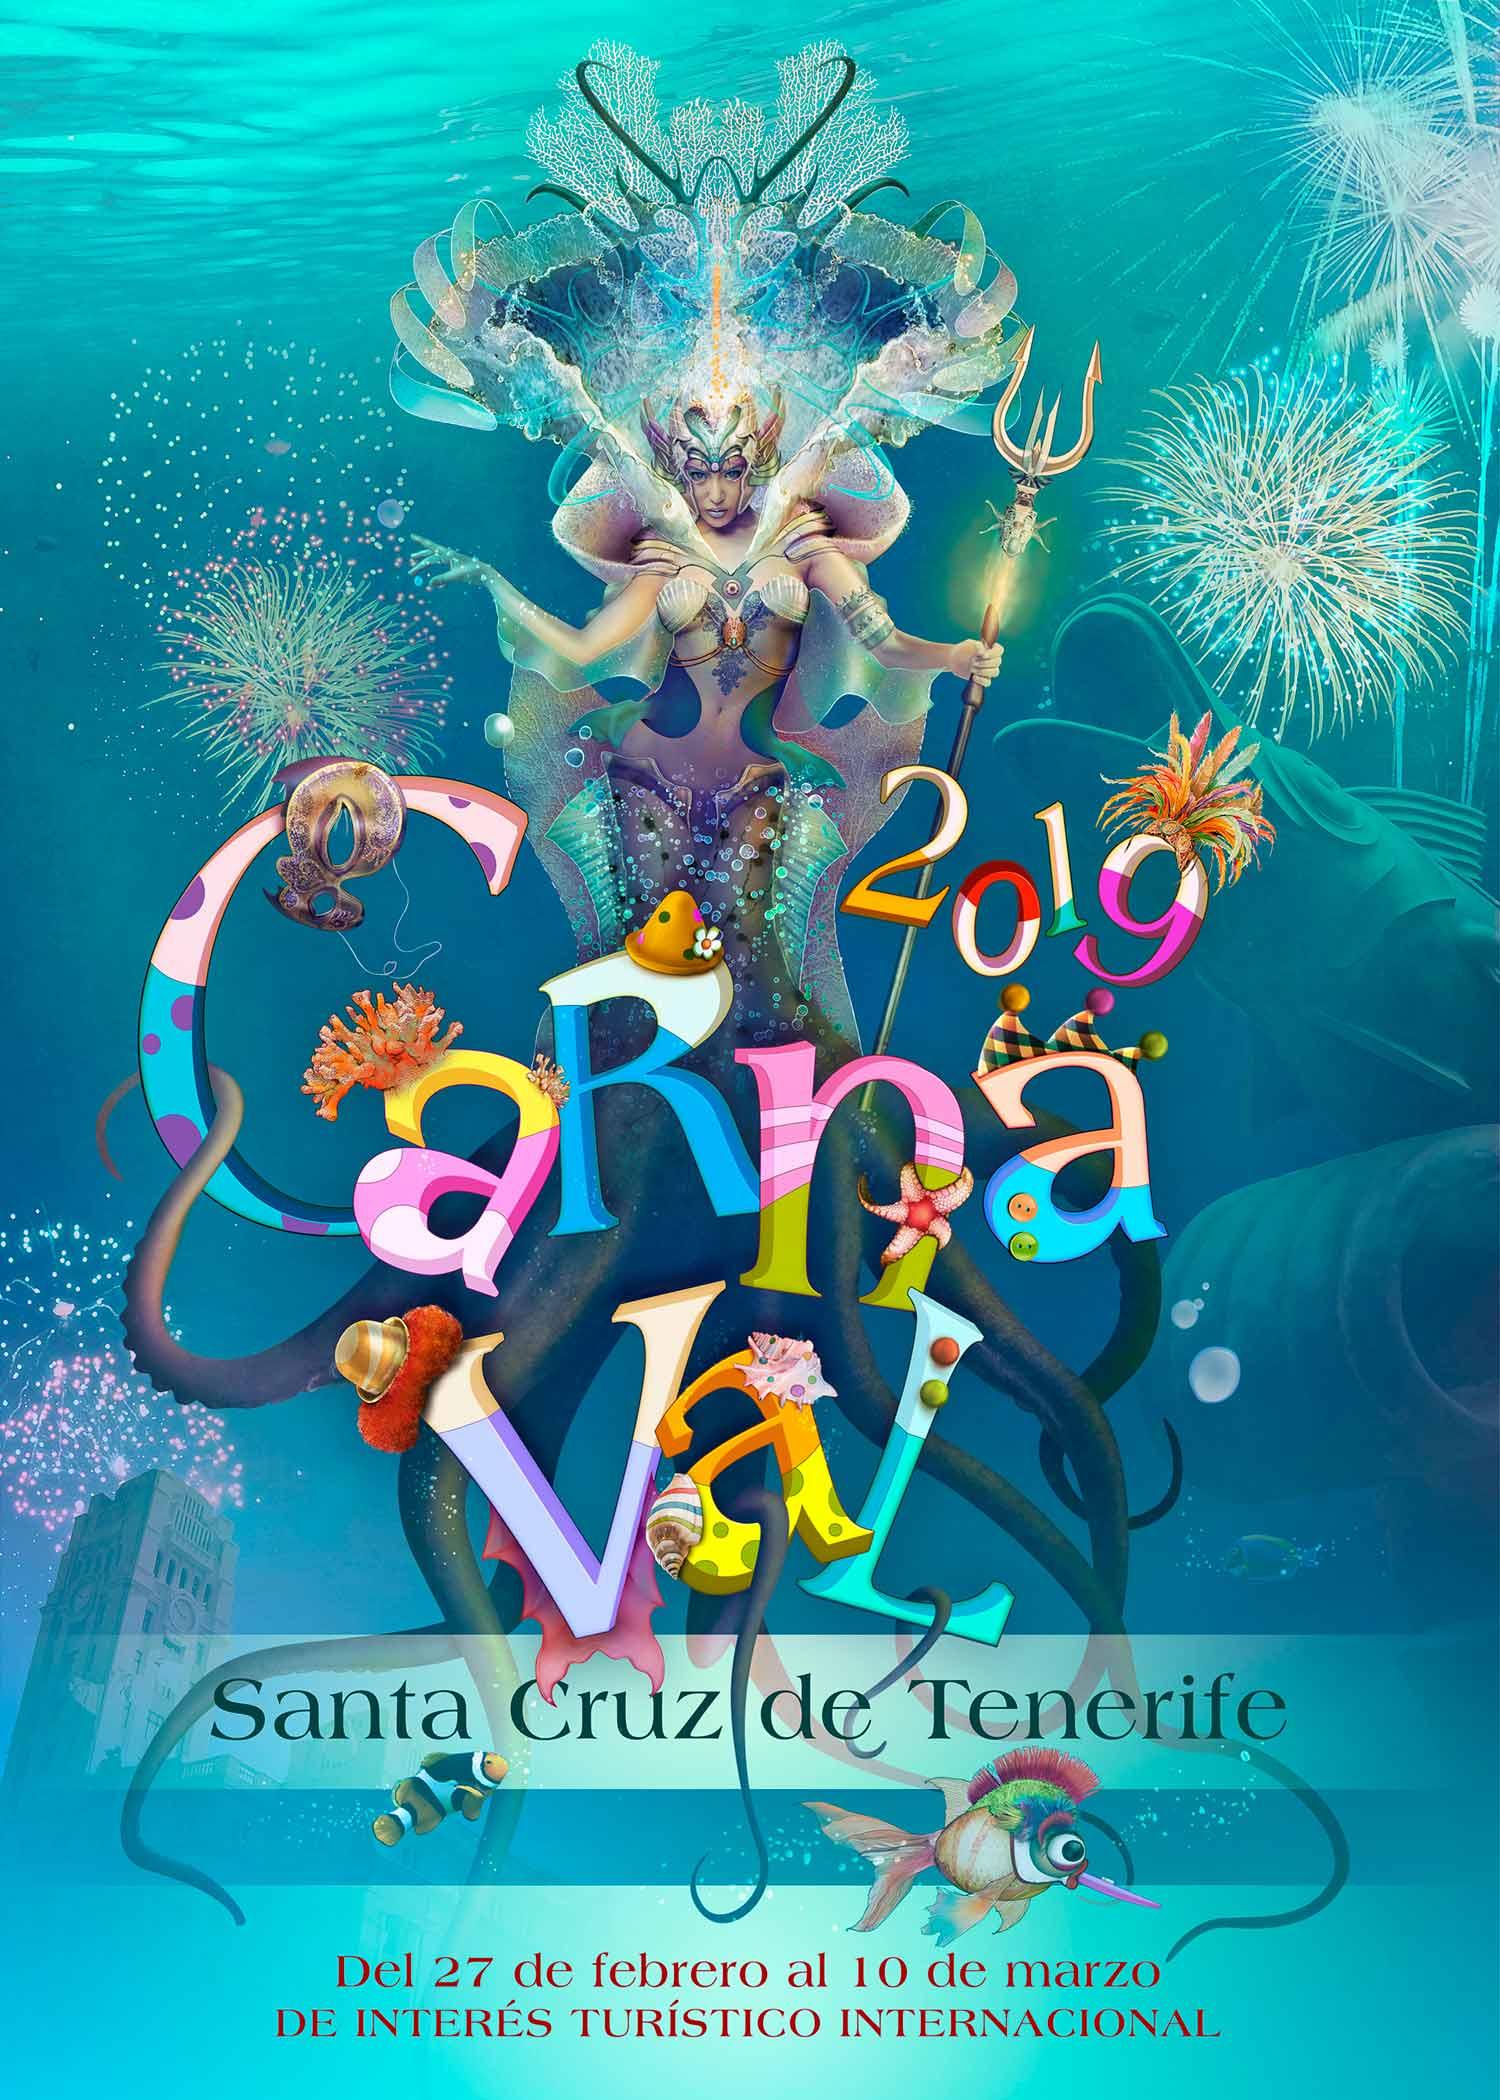 Carnaval 2019 - Santa Cruz de Tenerife